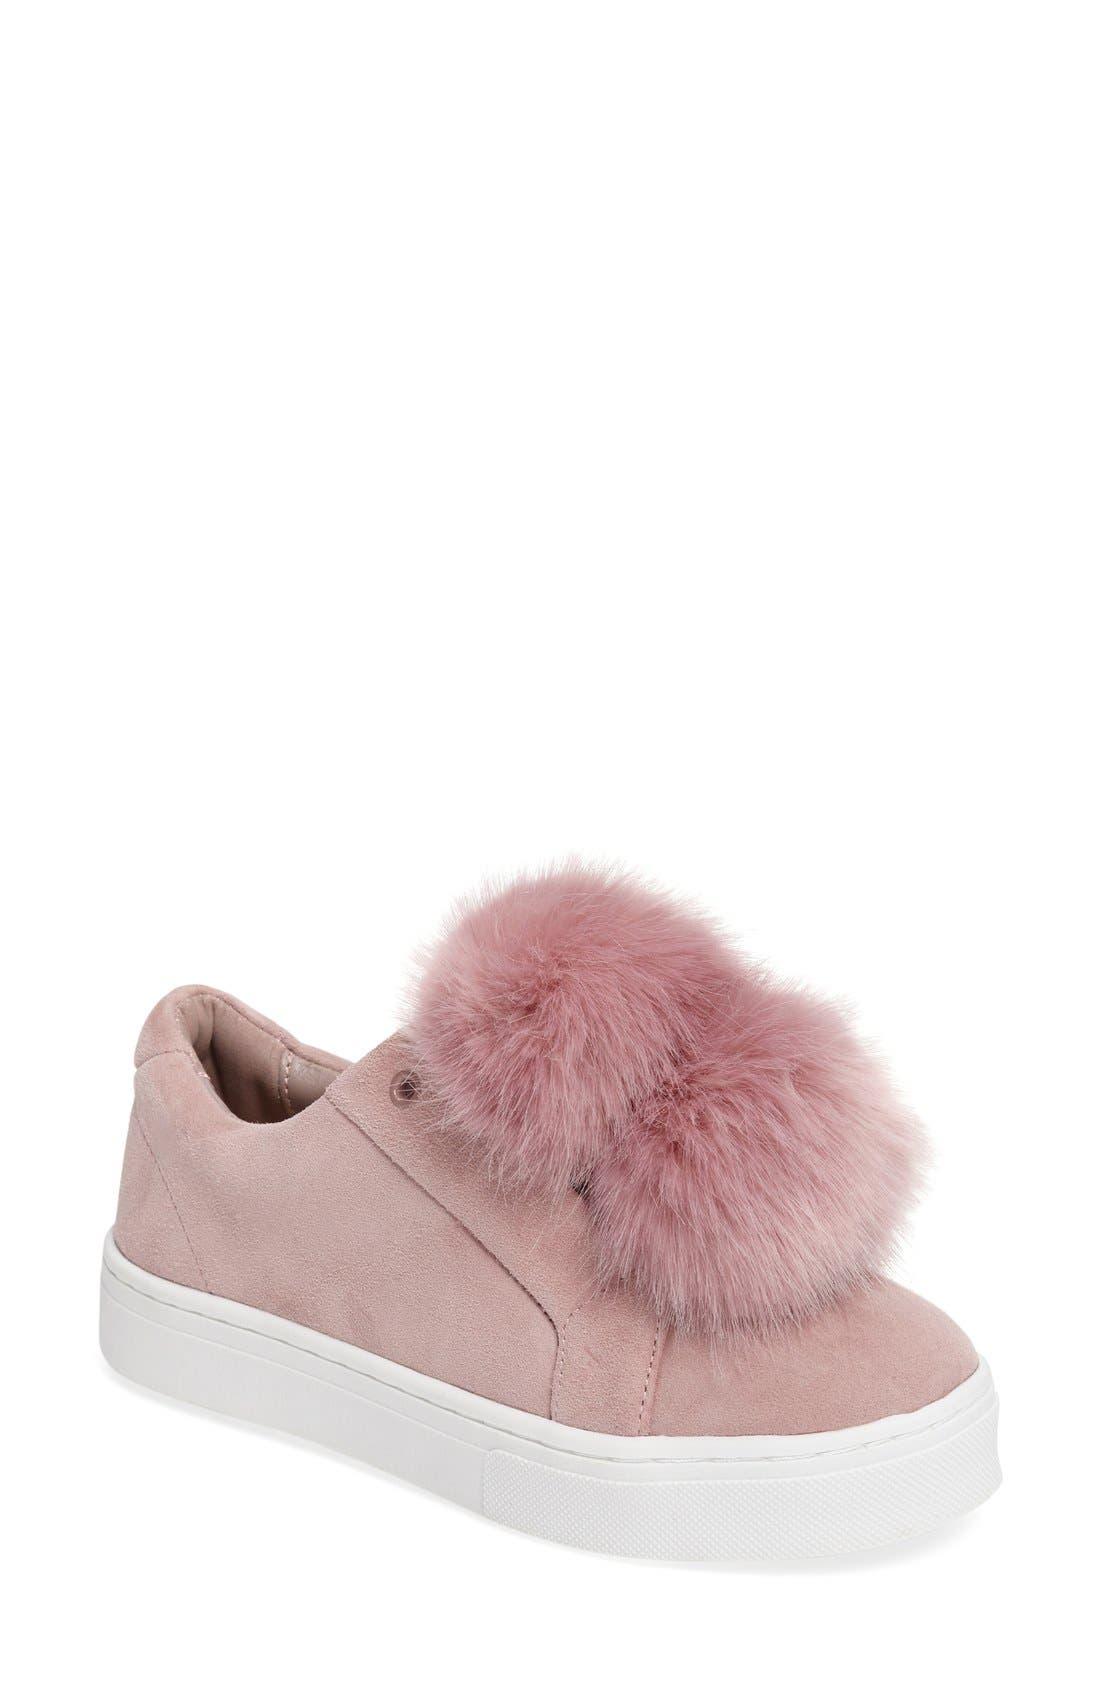 Alternate Image 1 Selected - Sam Edelman 'Leya' Faux Fur Laceless Sneaker (Women)